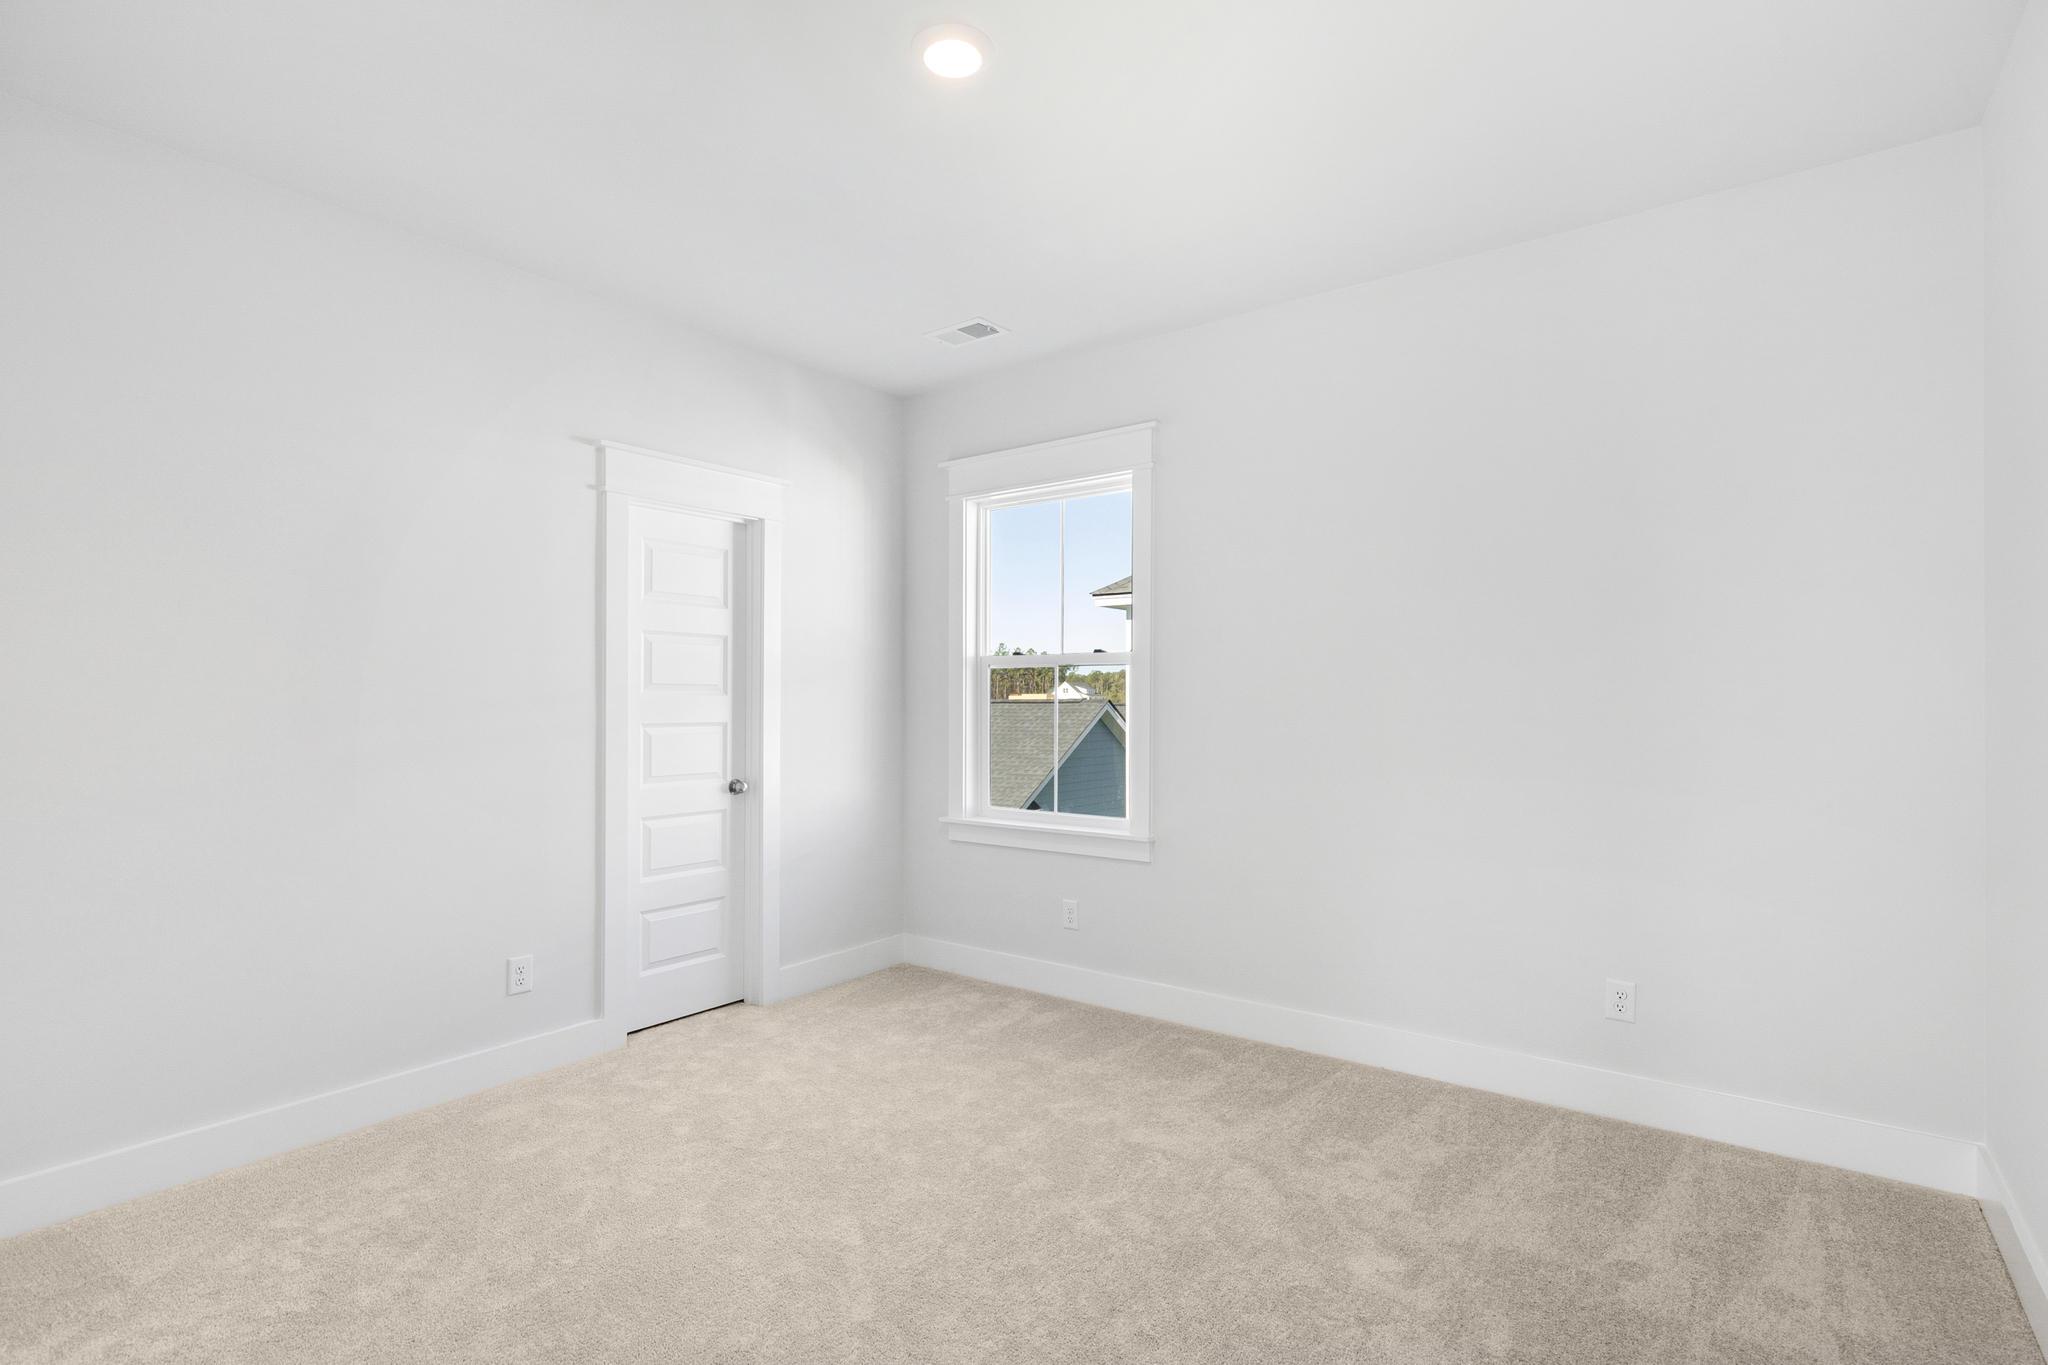 Carolina Park Homes For Sale - 1766 Sandy Brook, Mount Pleasant, SC - 13